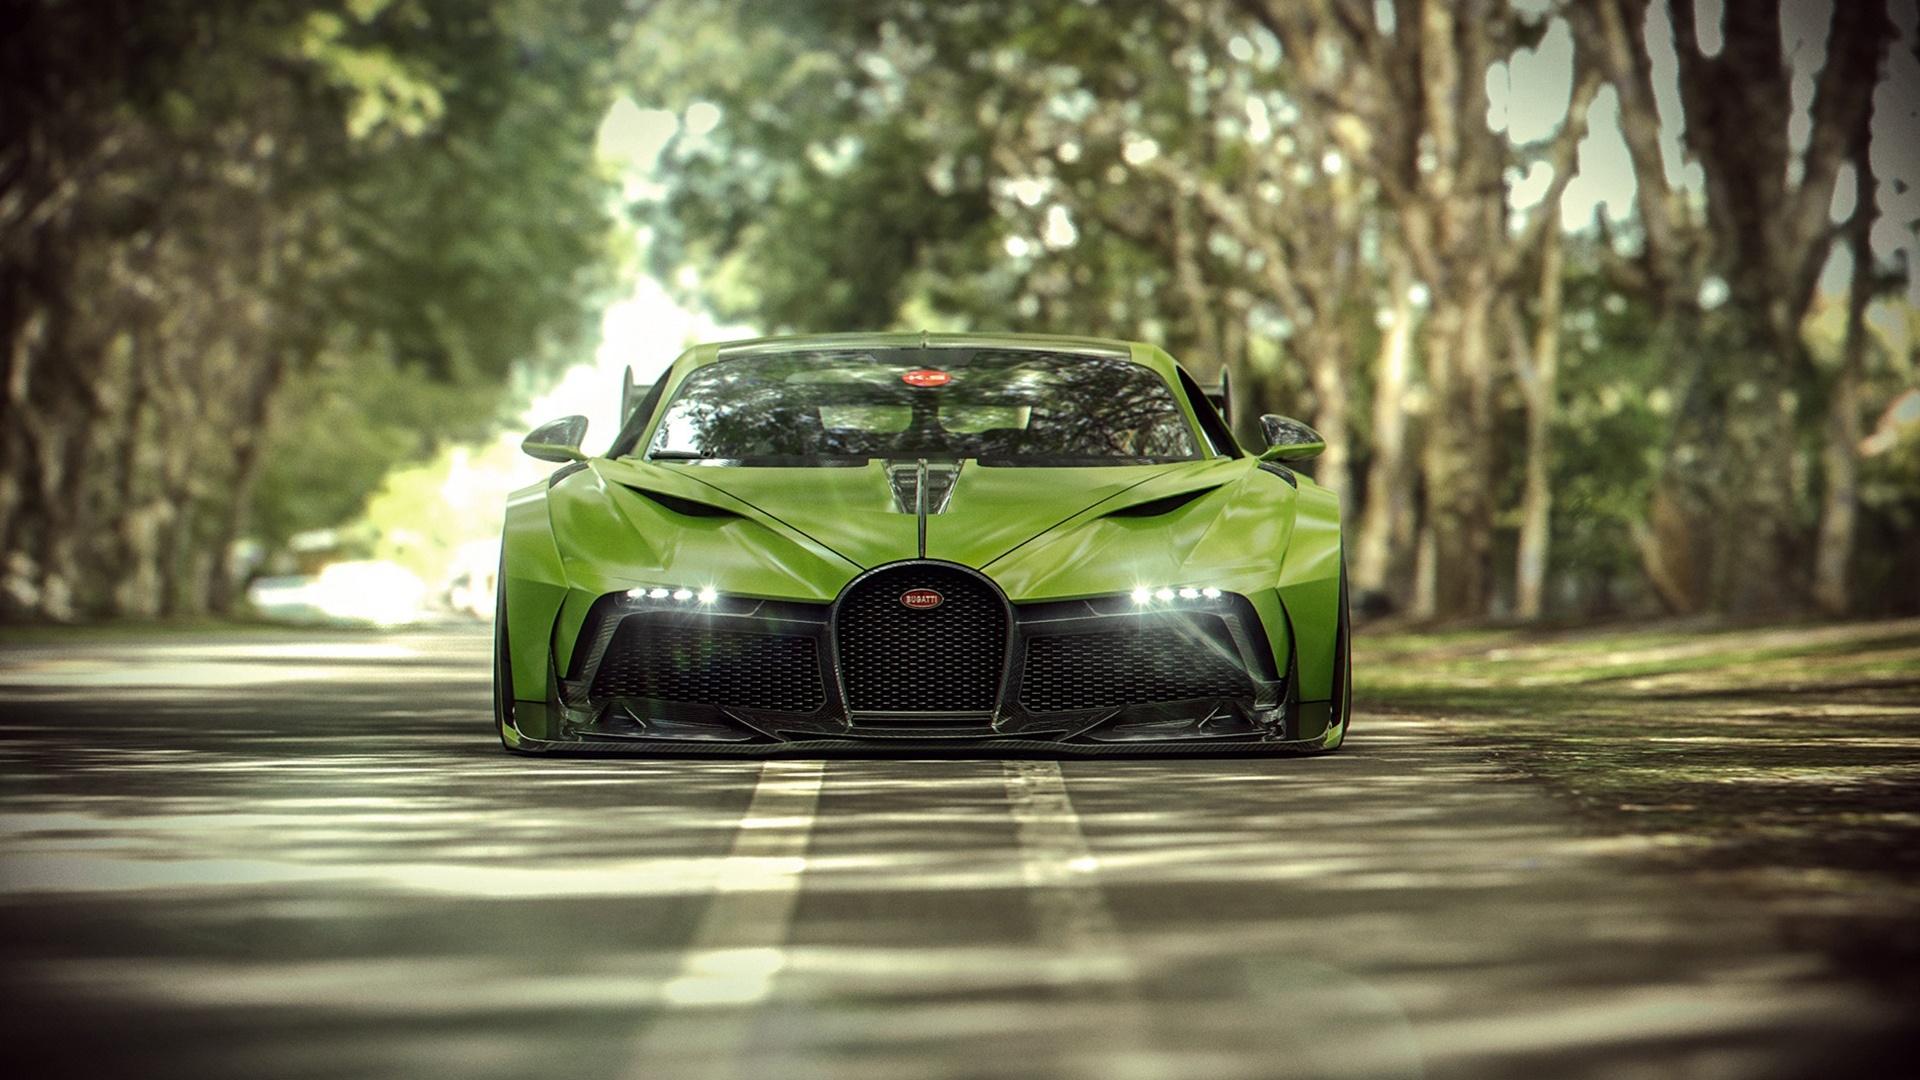 Green Bugatti Divo wallpaper - backiee